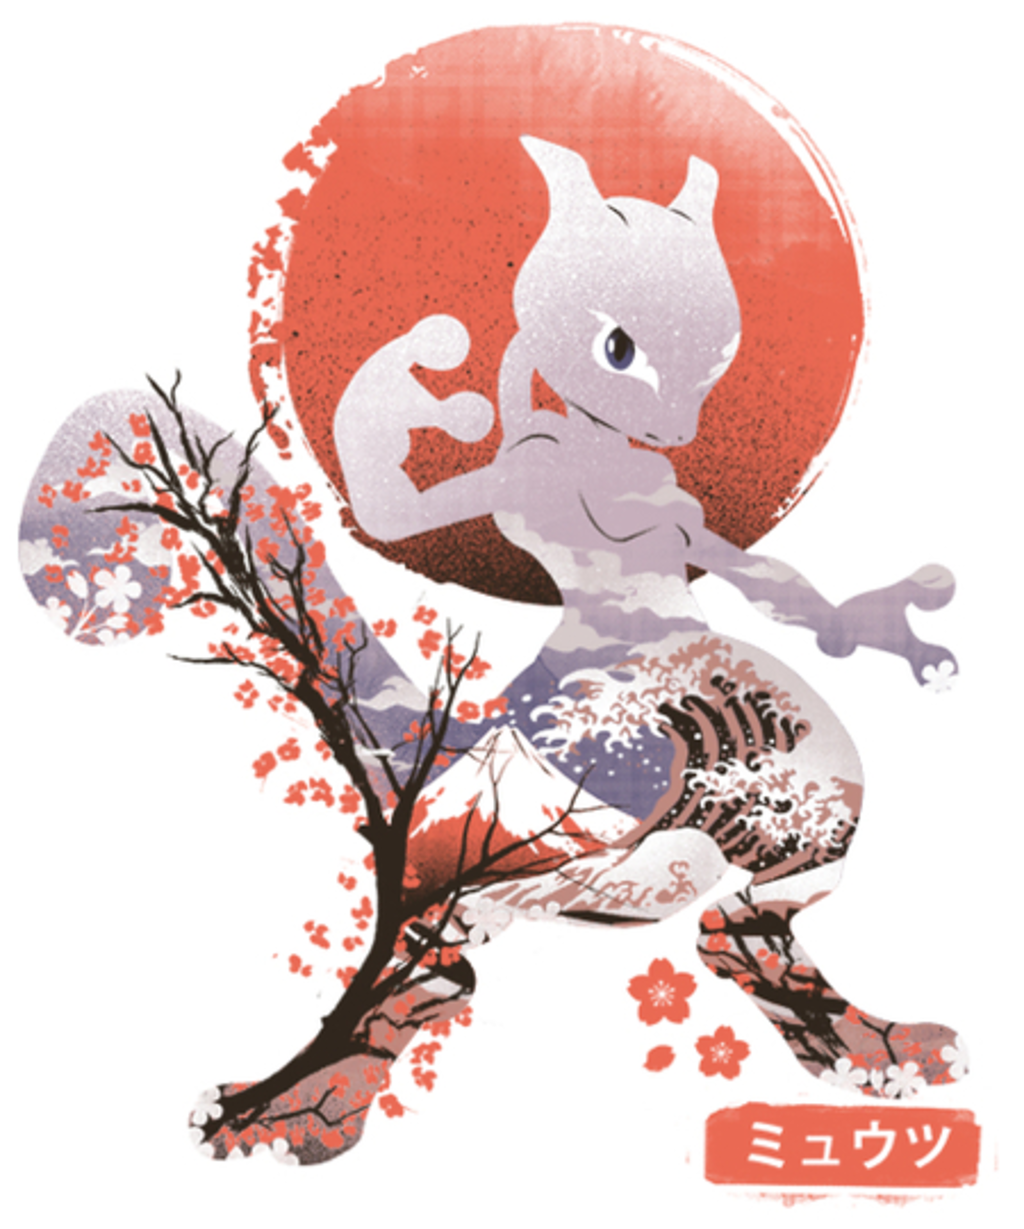 Qwertee: Pokiyo-e Legendary Monster